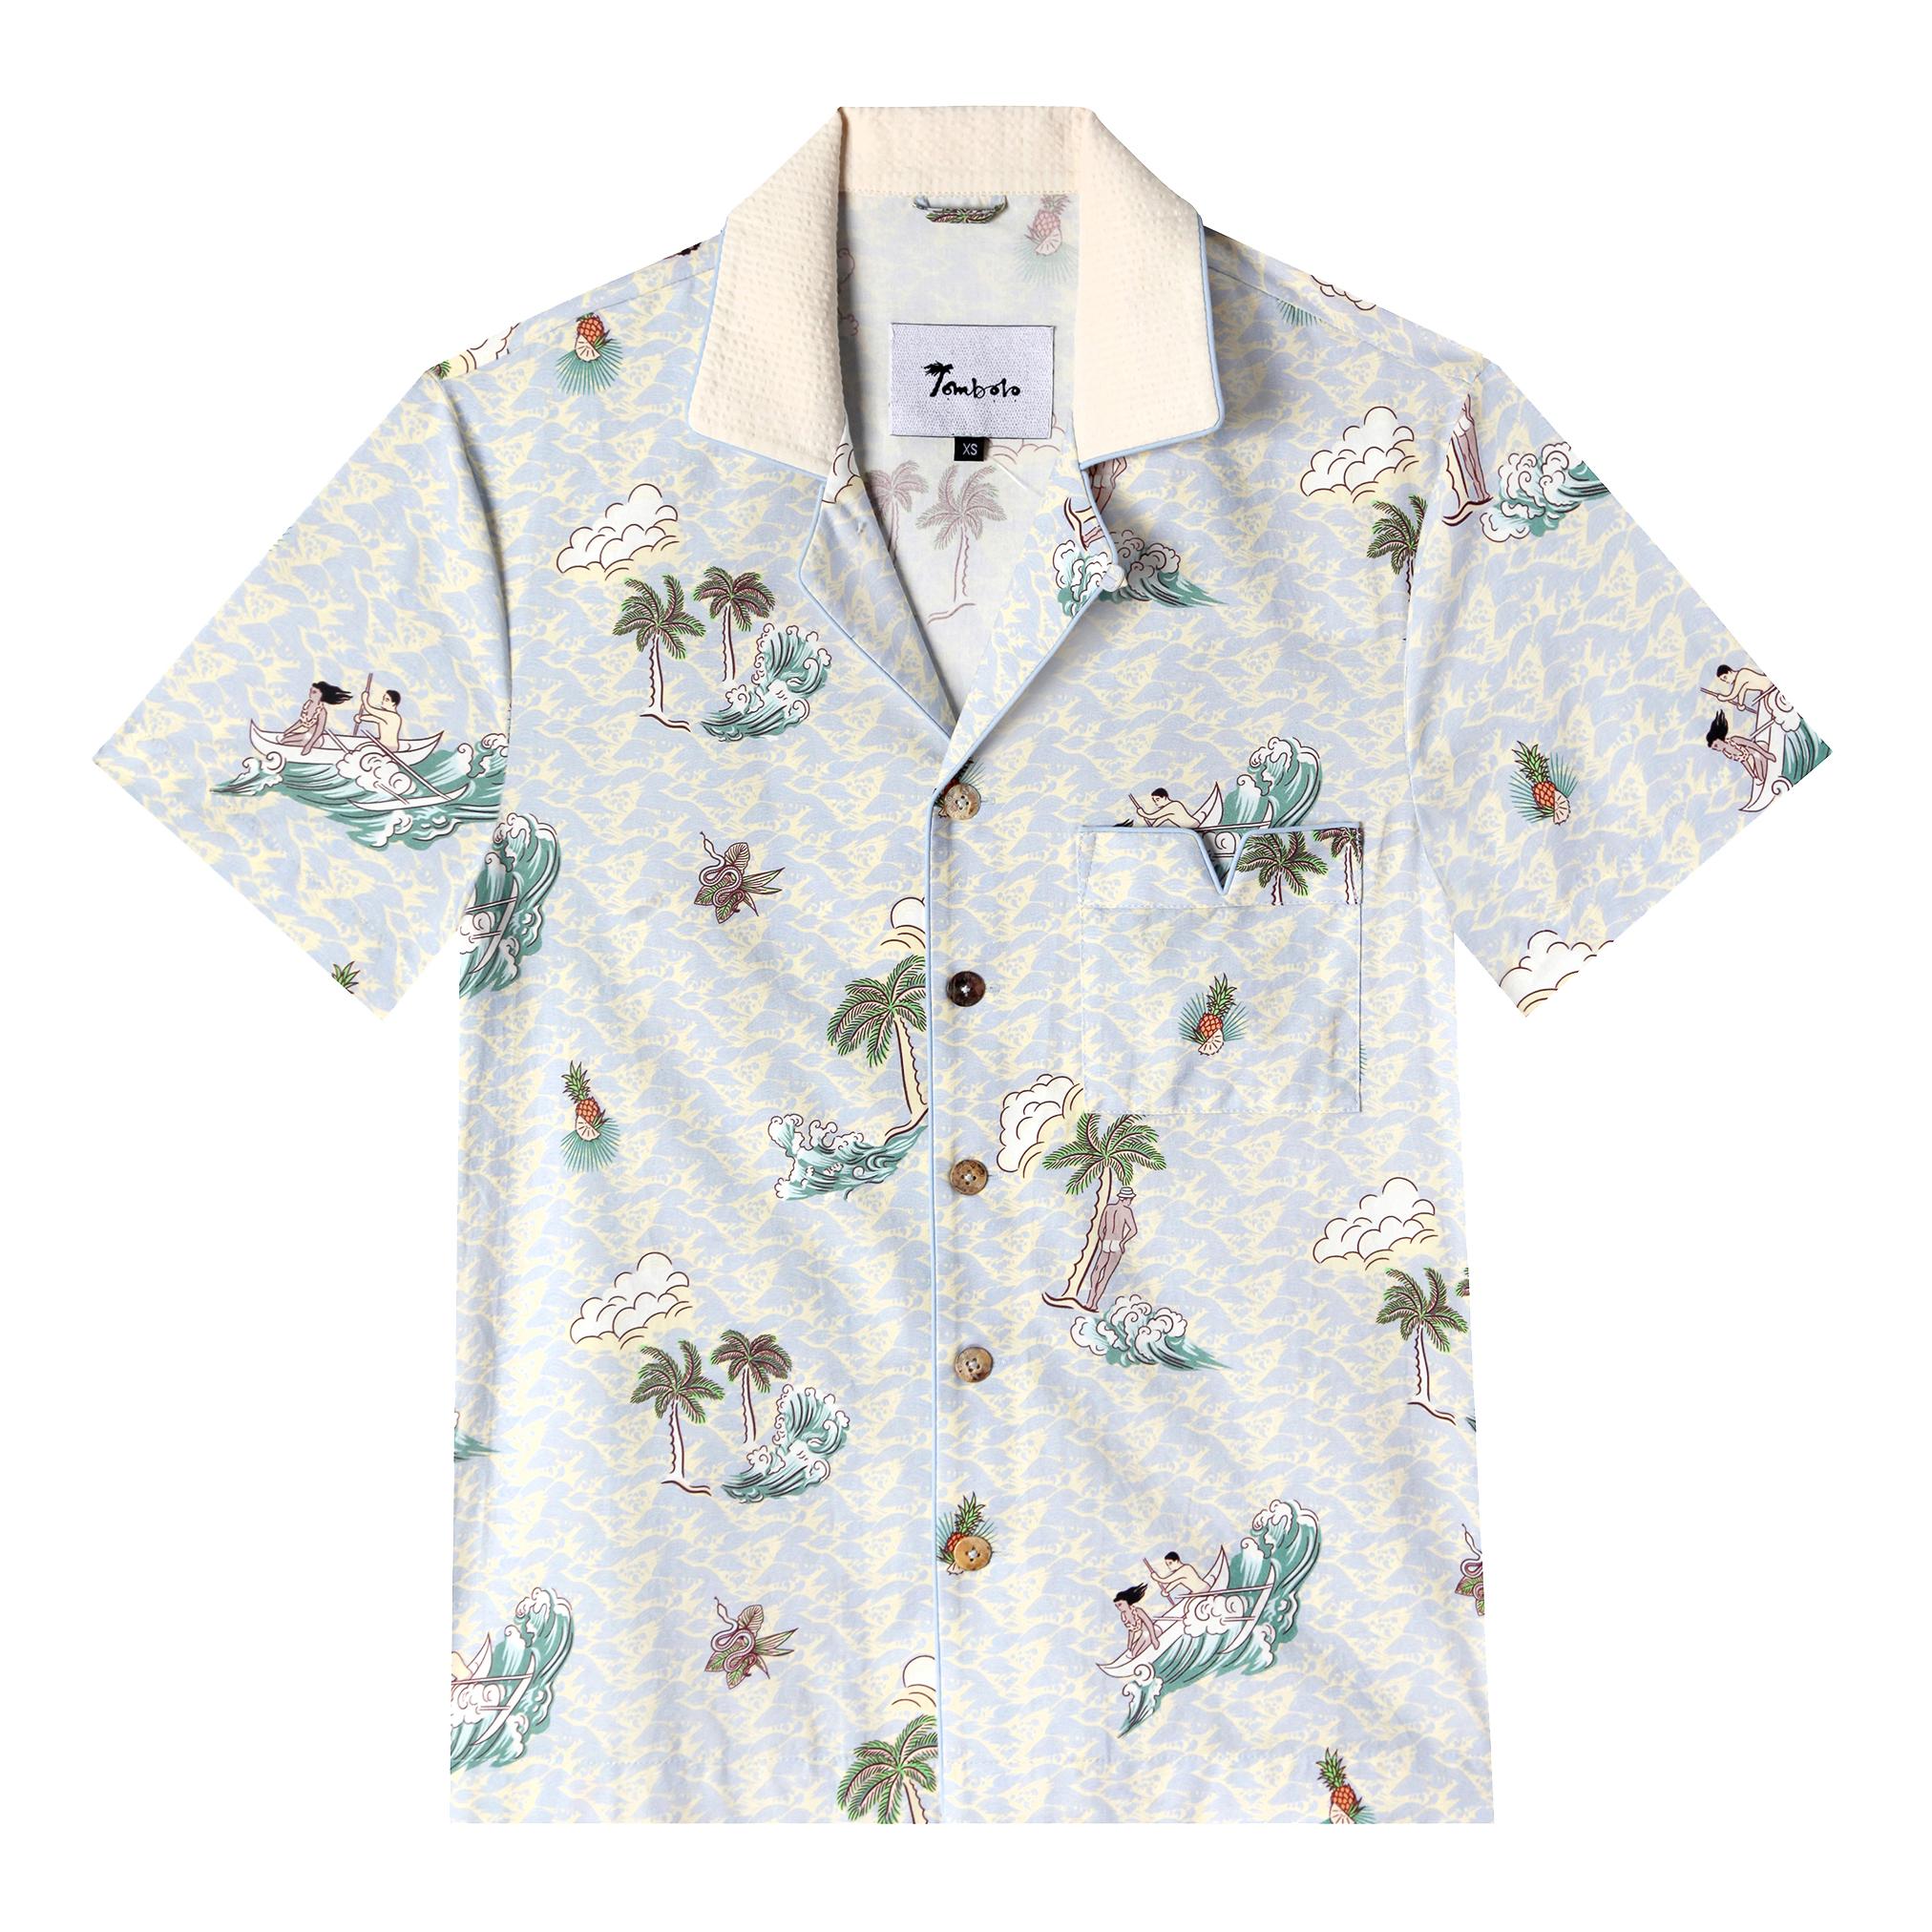 Shop Shirts Short Sleeve Shop Shirts Short Short Shop OnlineHuckberry Sleeve OnlineHuckberry vmN80nw